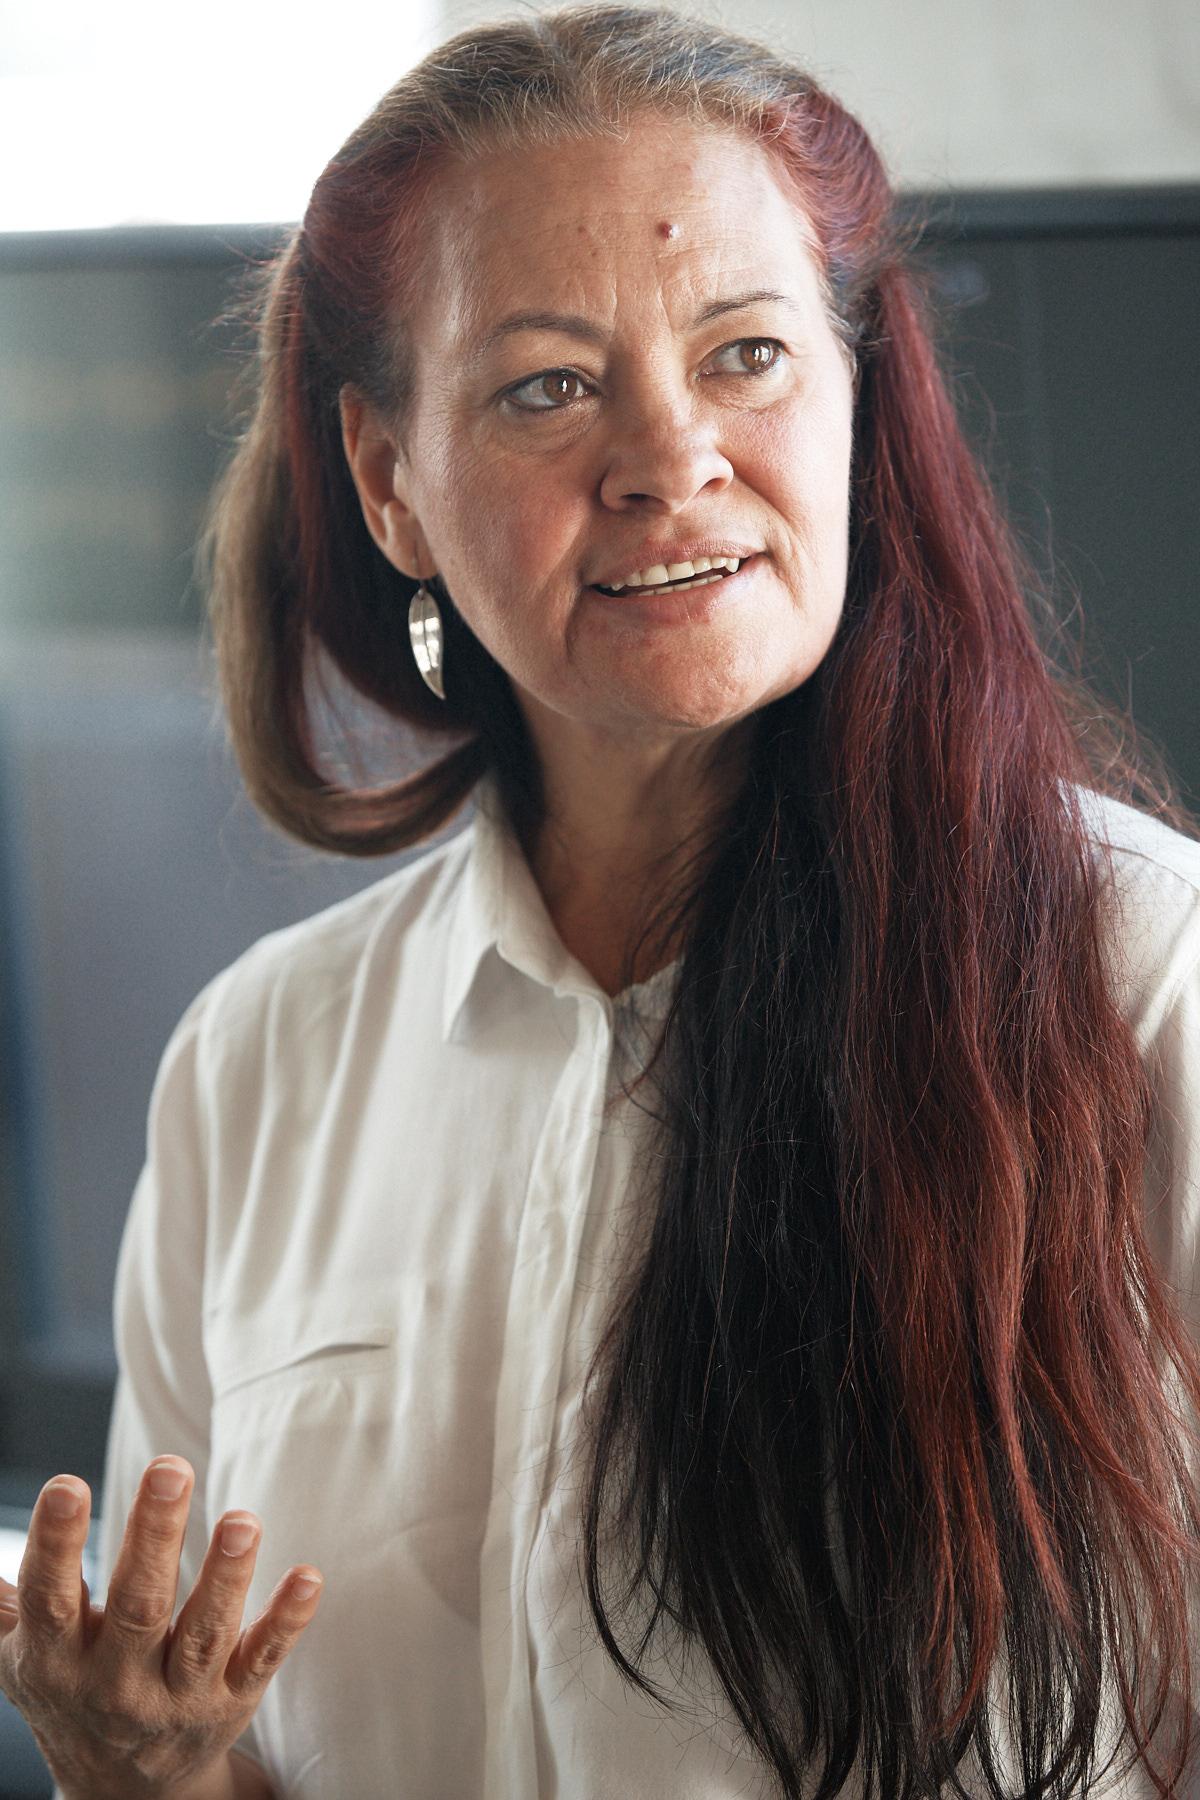 Photo of woman talking